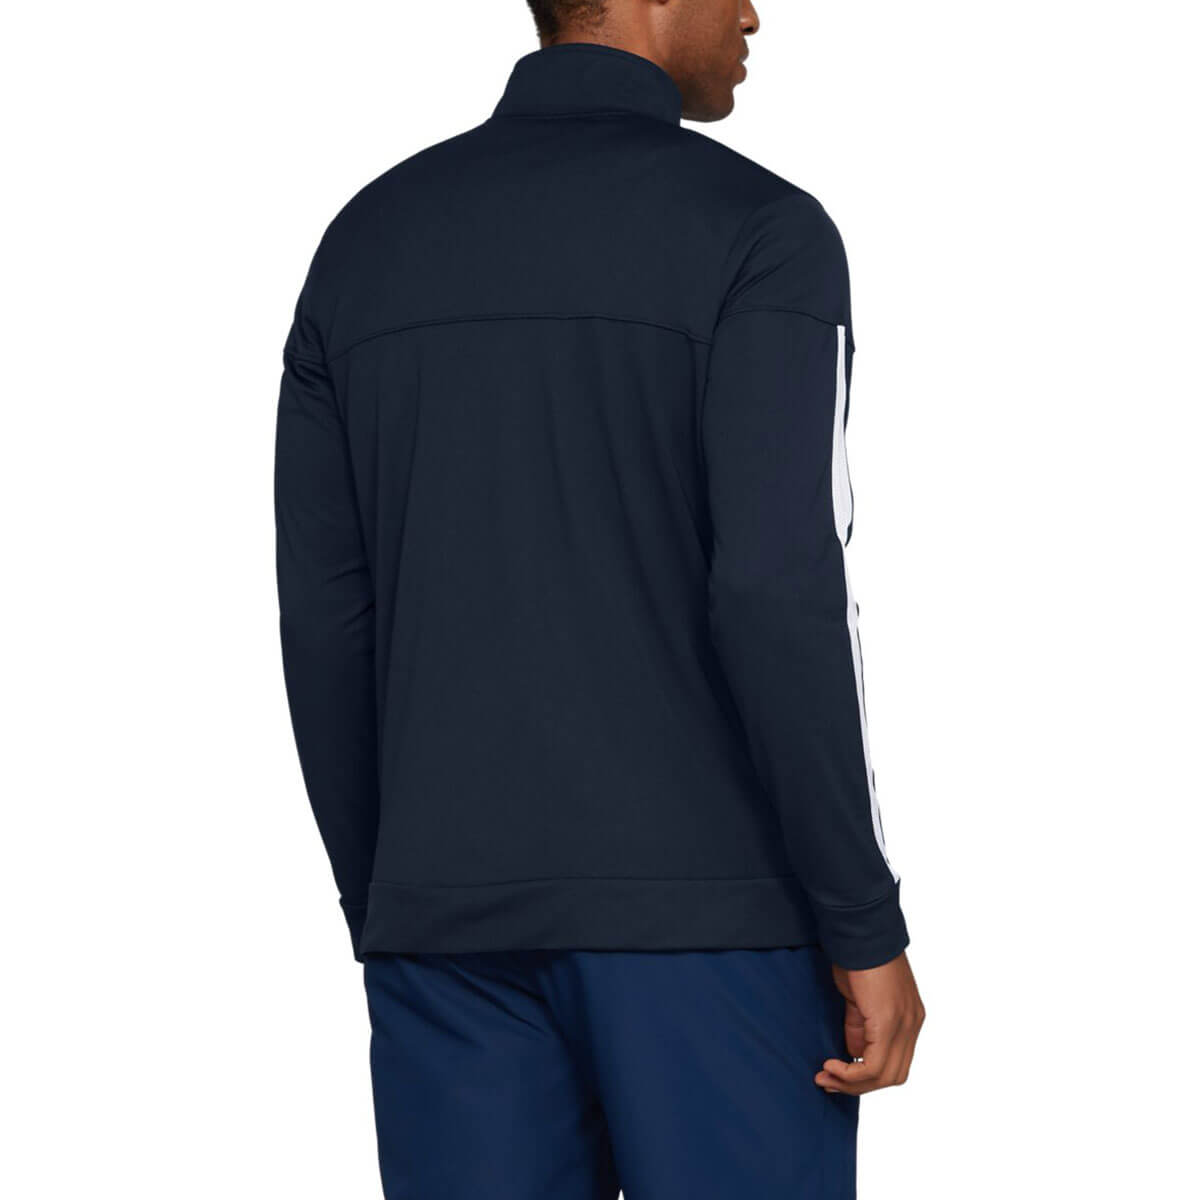 Under-Armour-Mens-2019-Sportstyle-Pique-Stretch-Quick-Dry-Wicking-Fleece-Jacket miniatura 3